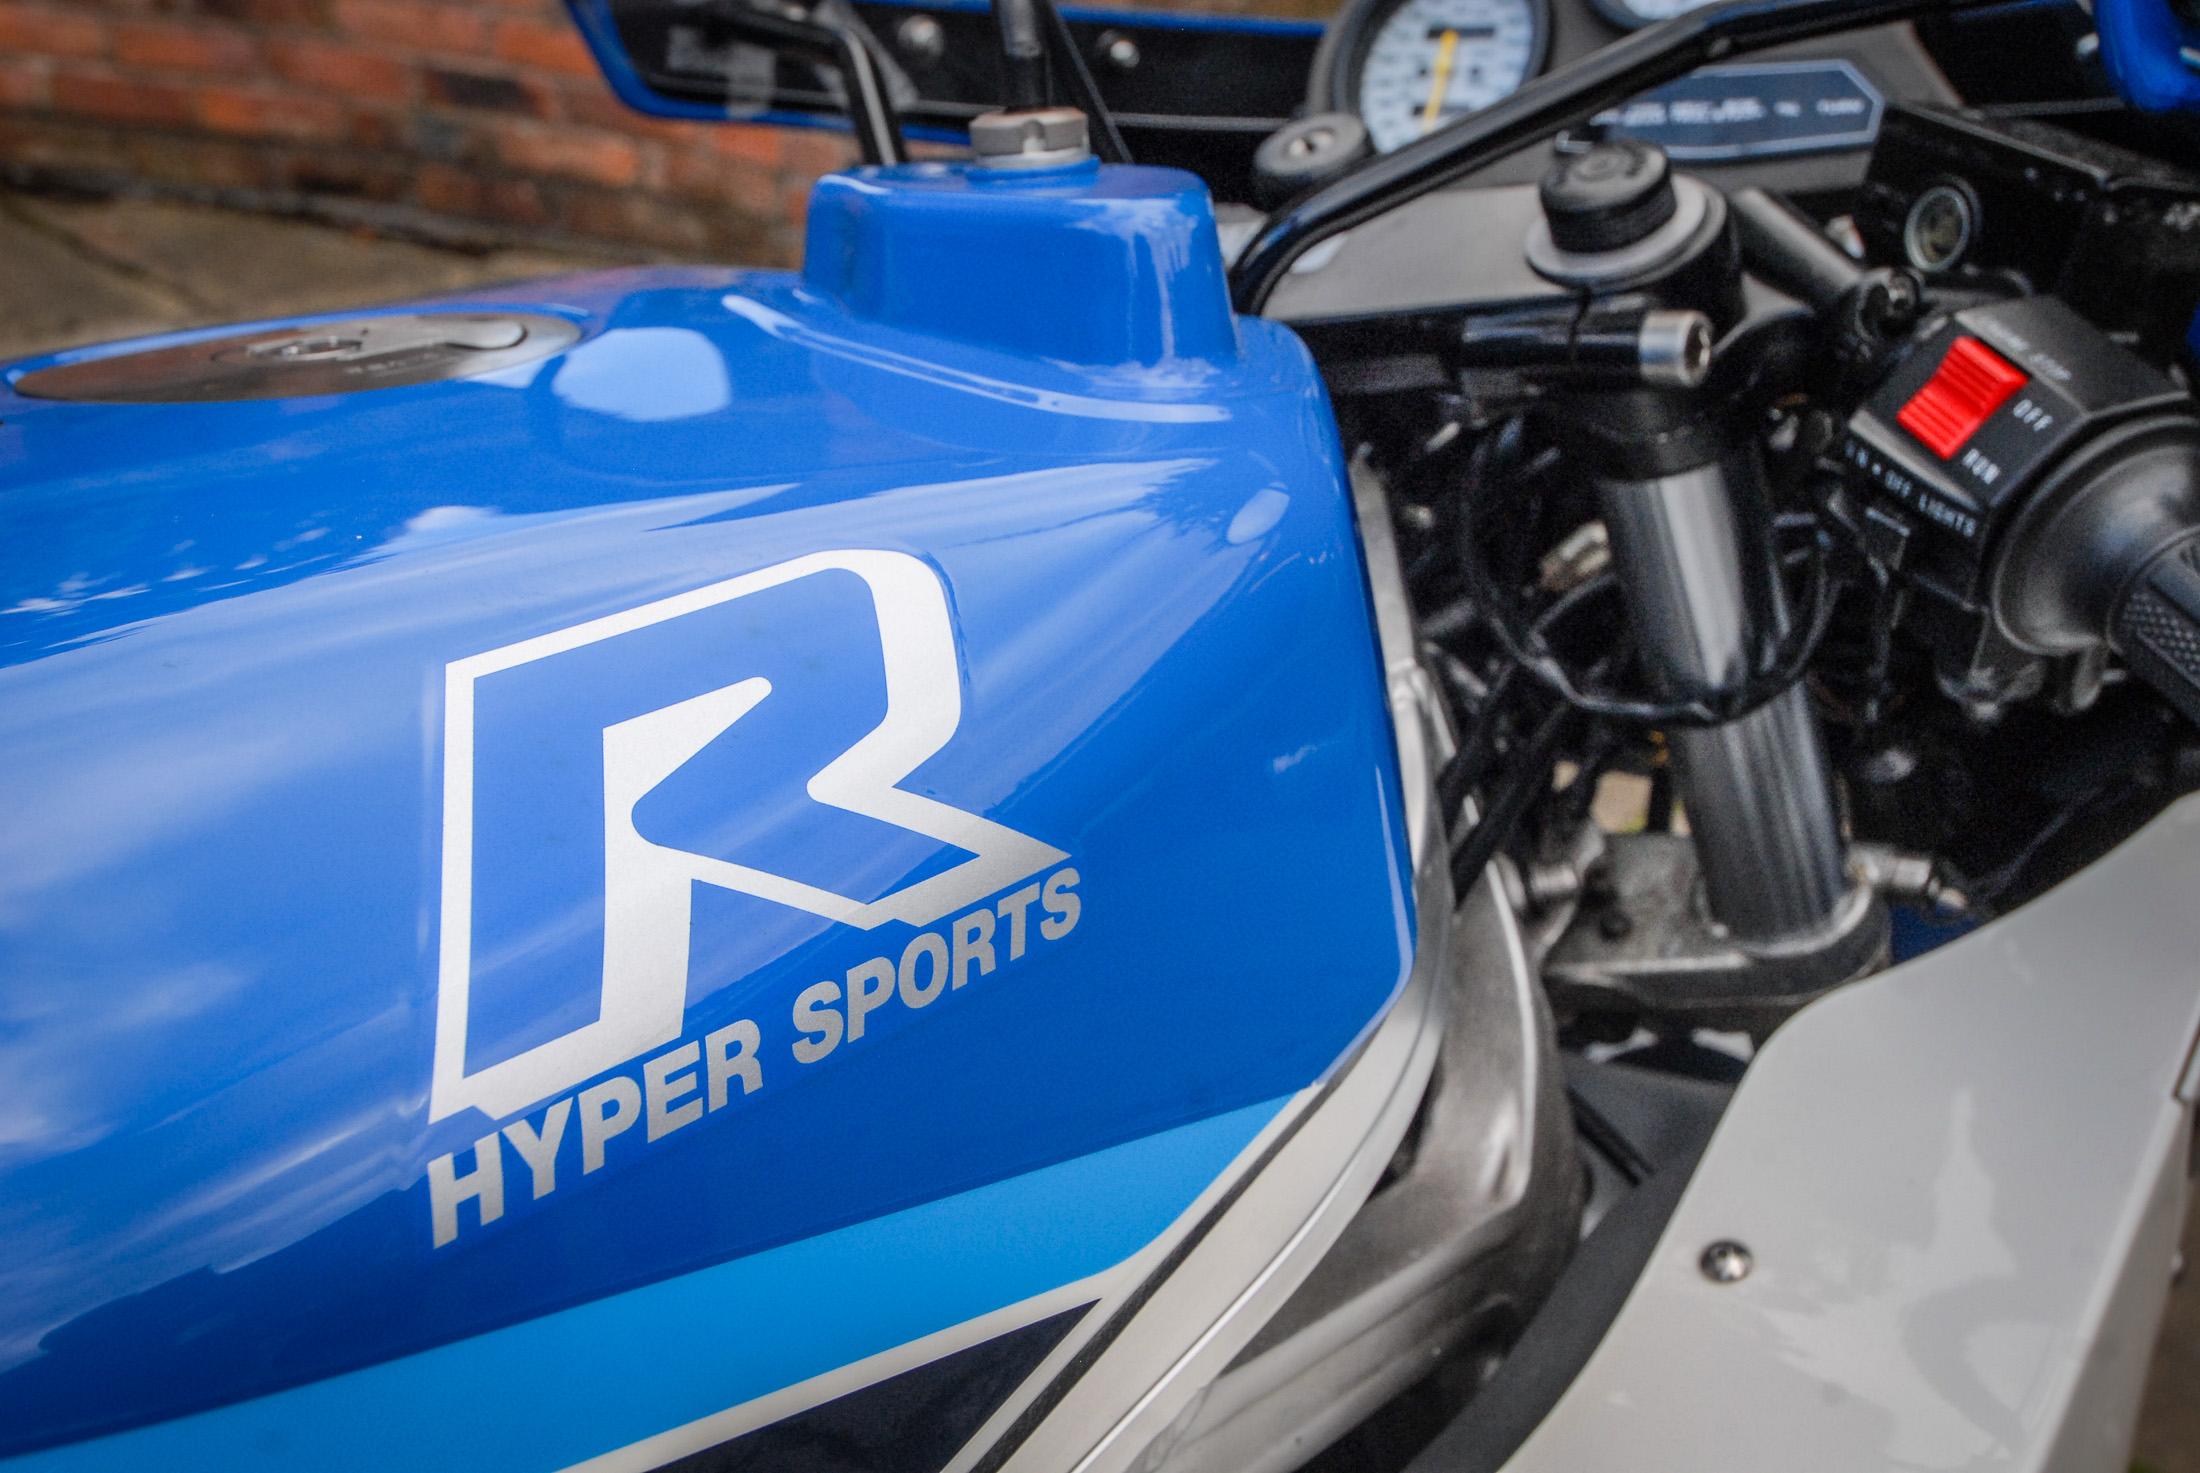 GSX-R hyper sports logo